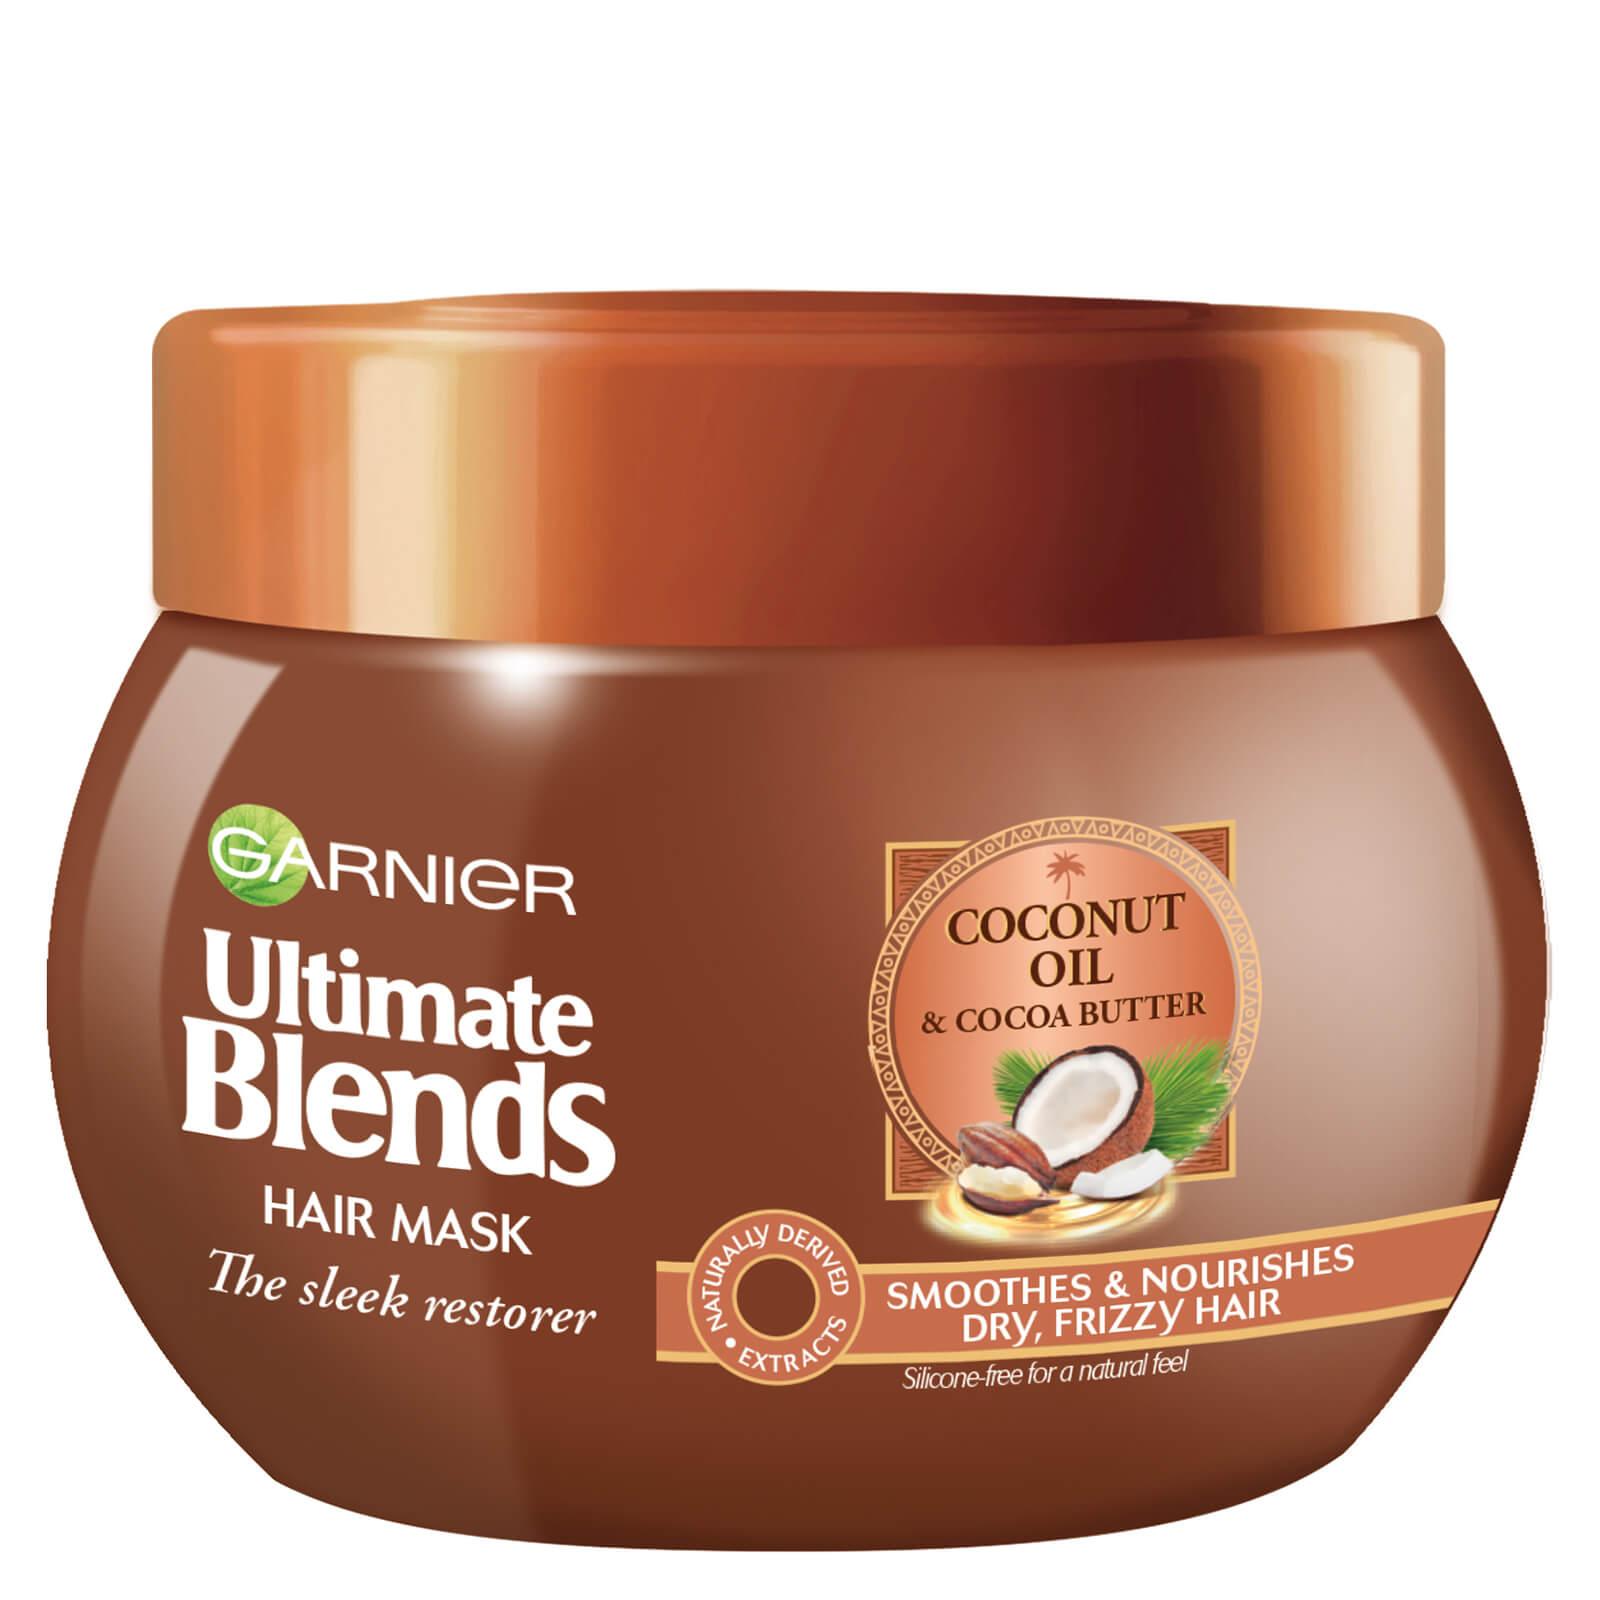 Garnier Ultimate Blends Coconut Oil Frizzy Hair Treatment Mask 300ml